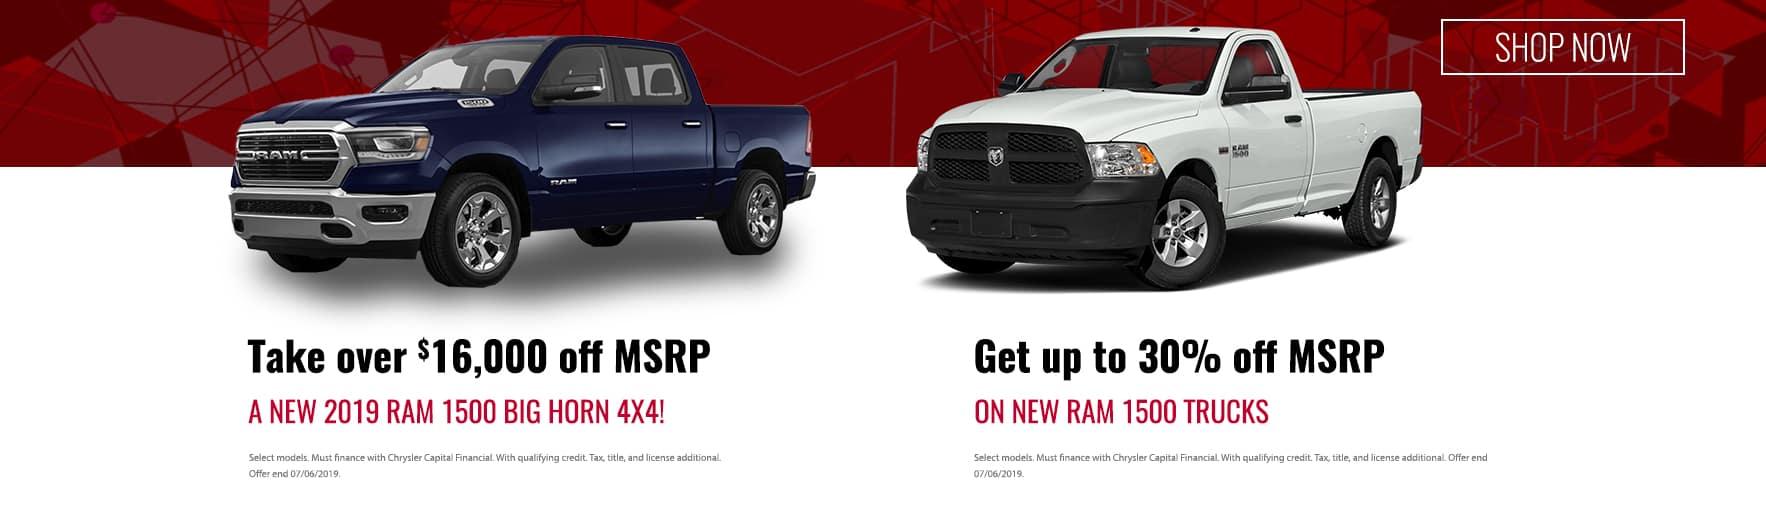 Ram 1500 Offers